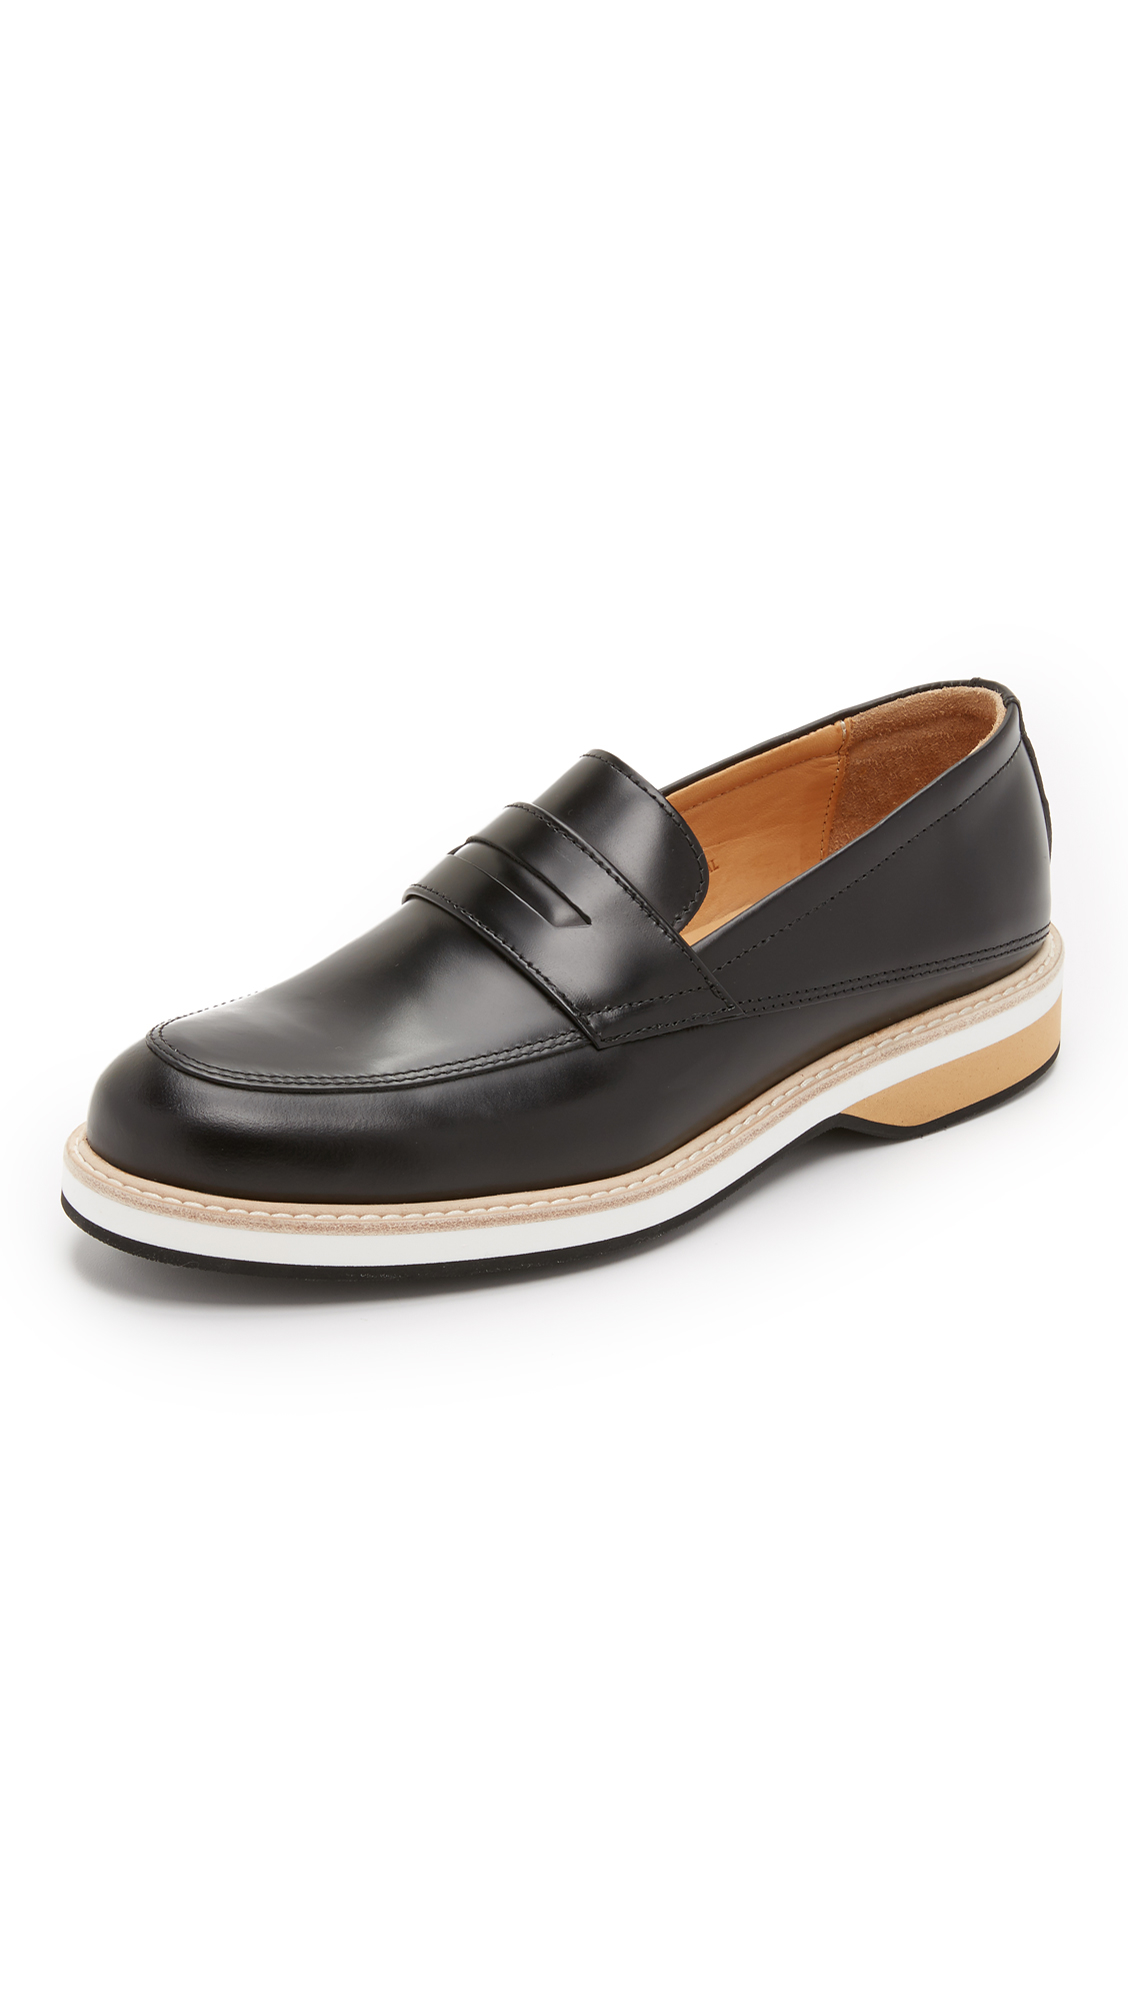 FOOTWEAR - Loafers Essentiel T3V1cWN3